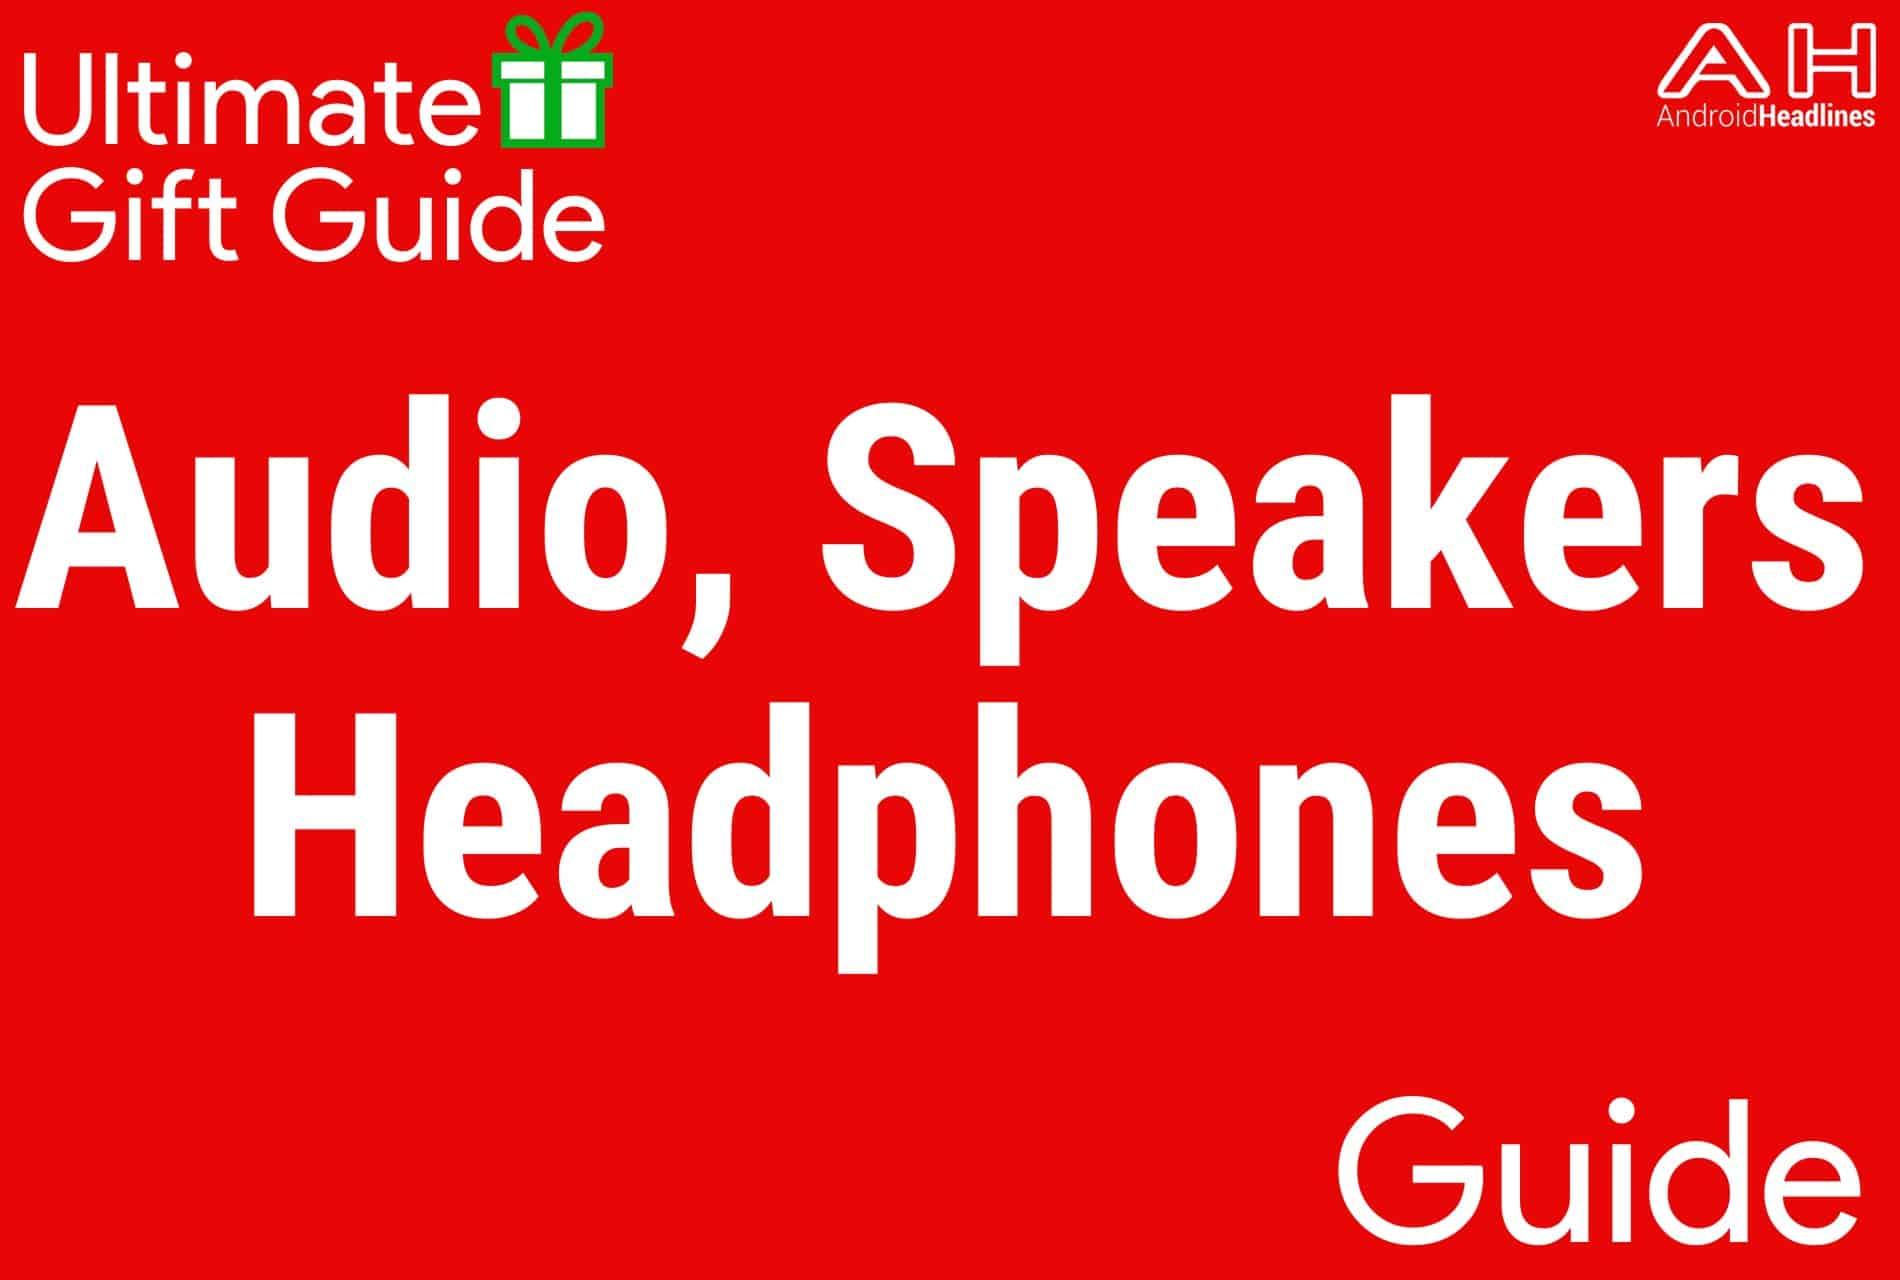 Audio, Speakers, Headphones - Holiday Gift Guide 2015-2016